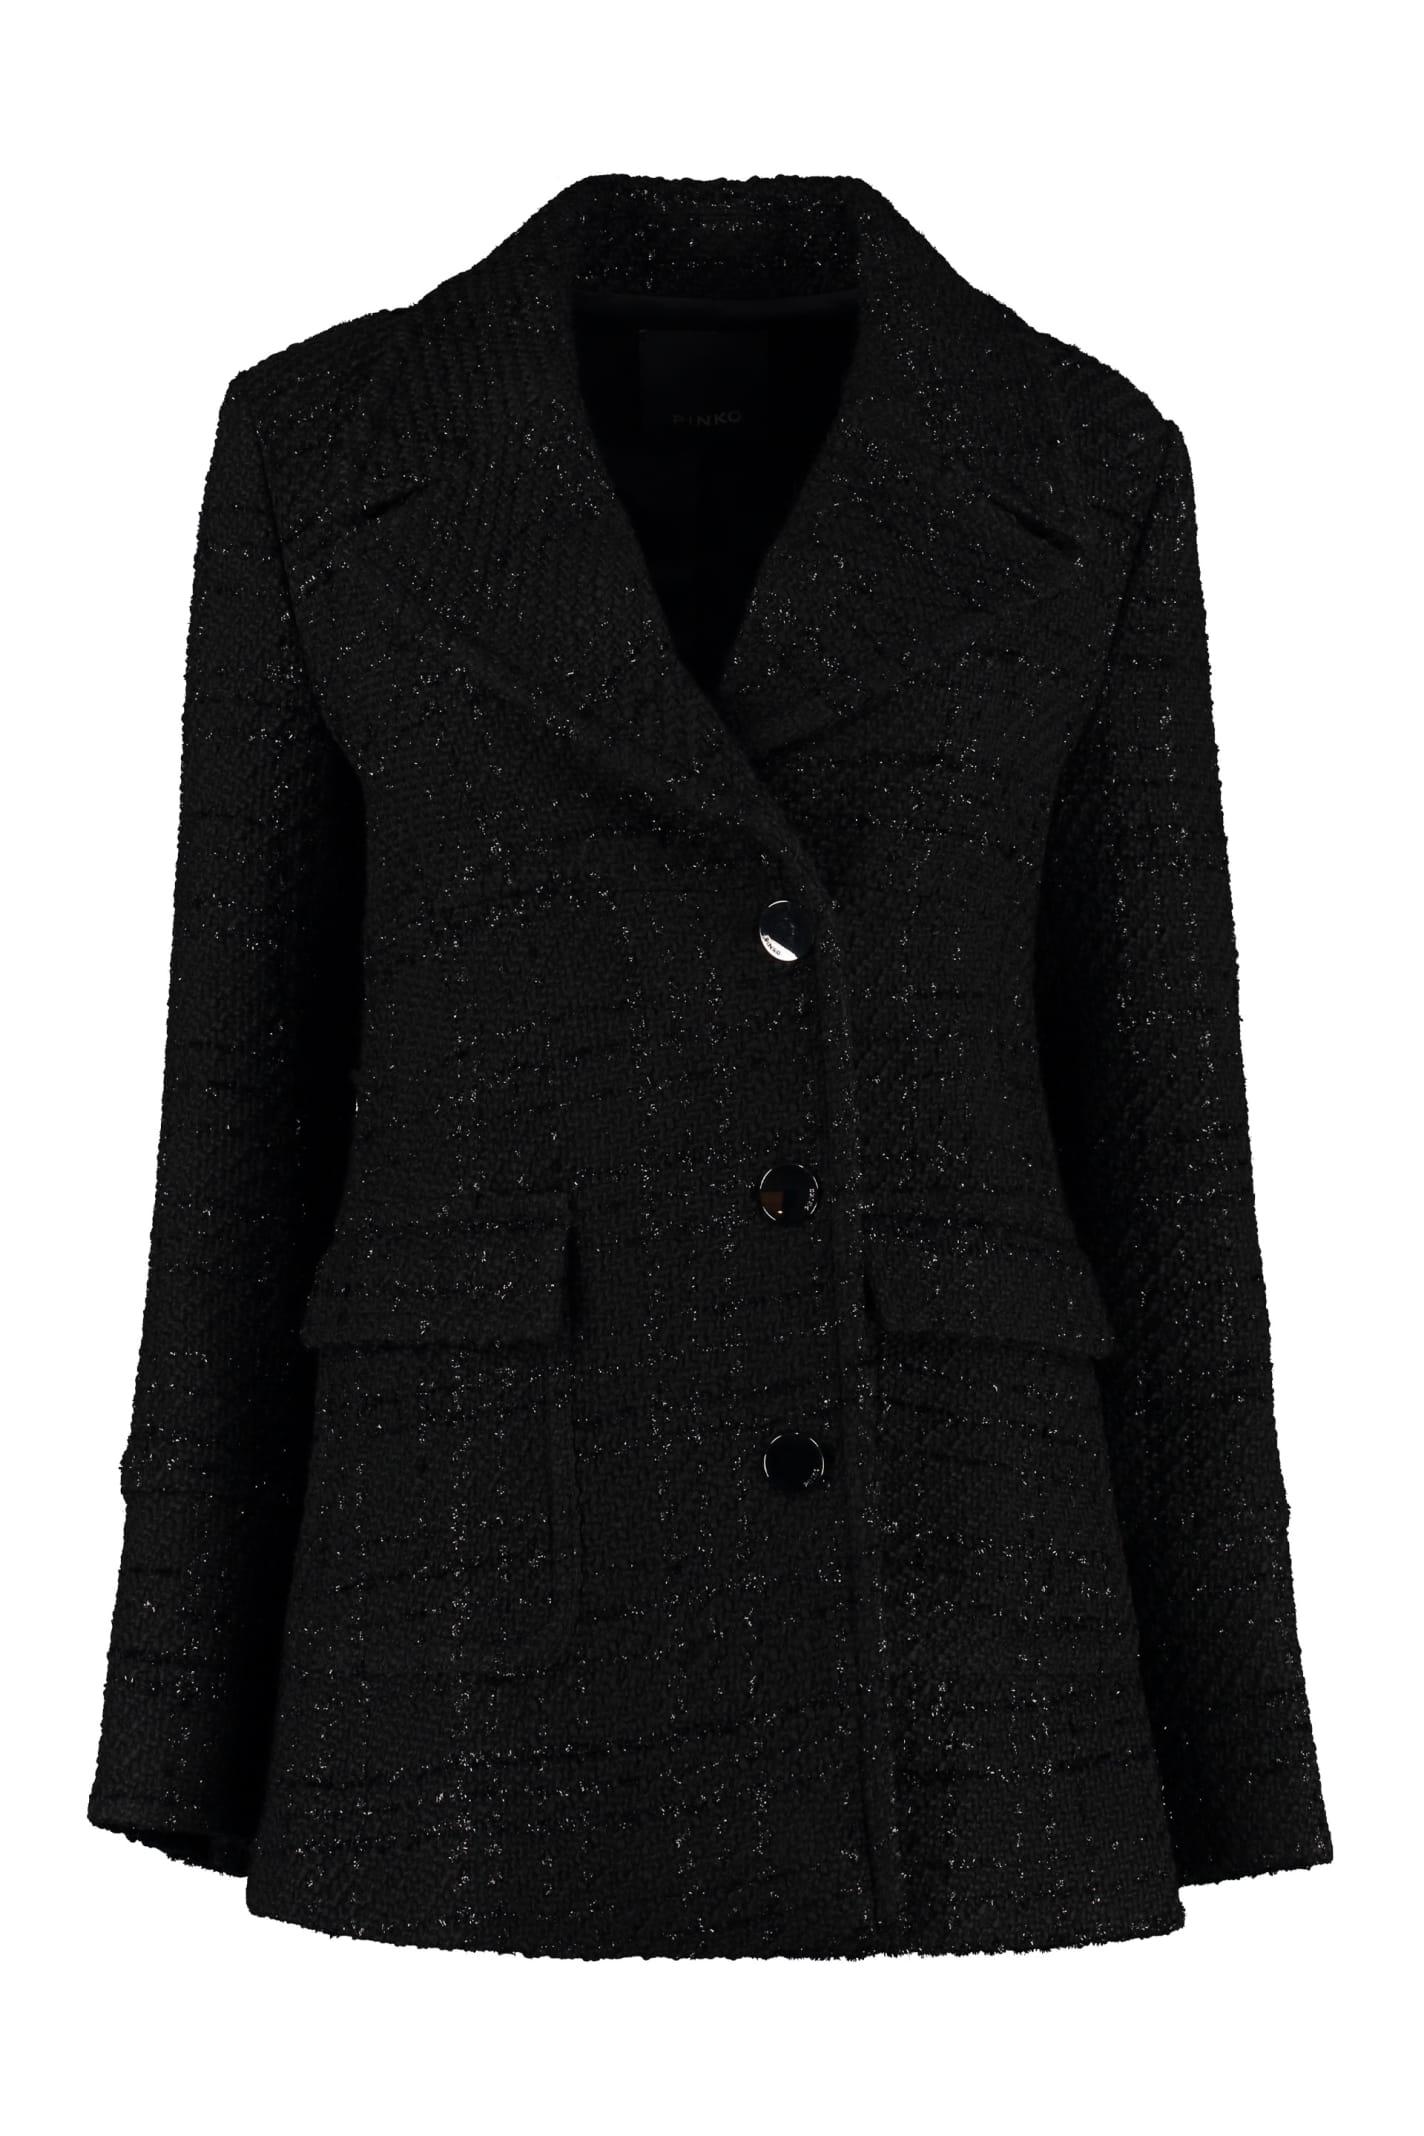 Pinko Scendere Tweed Jacket